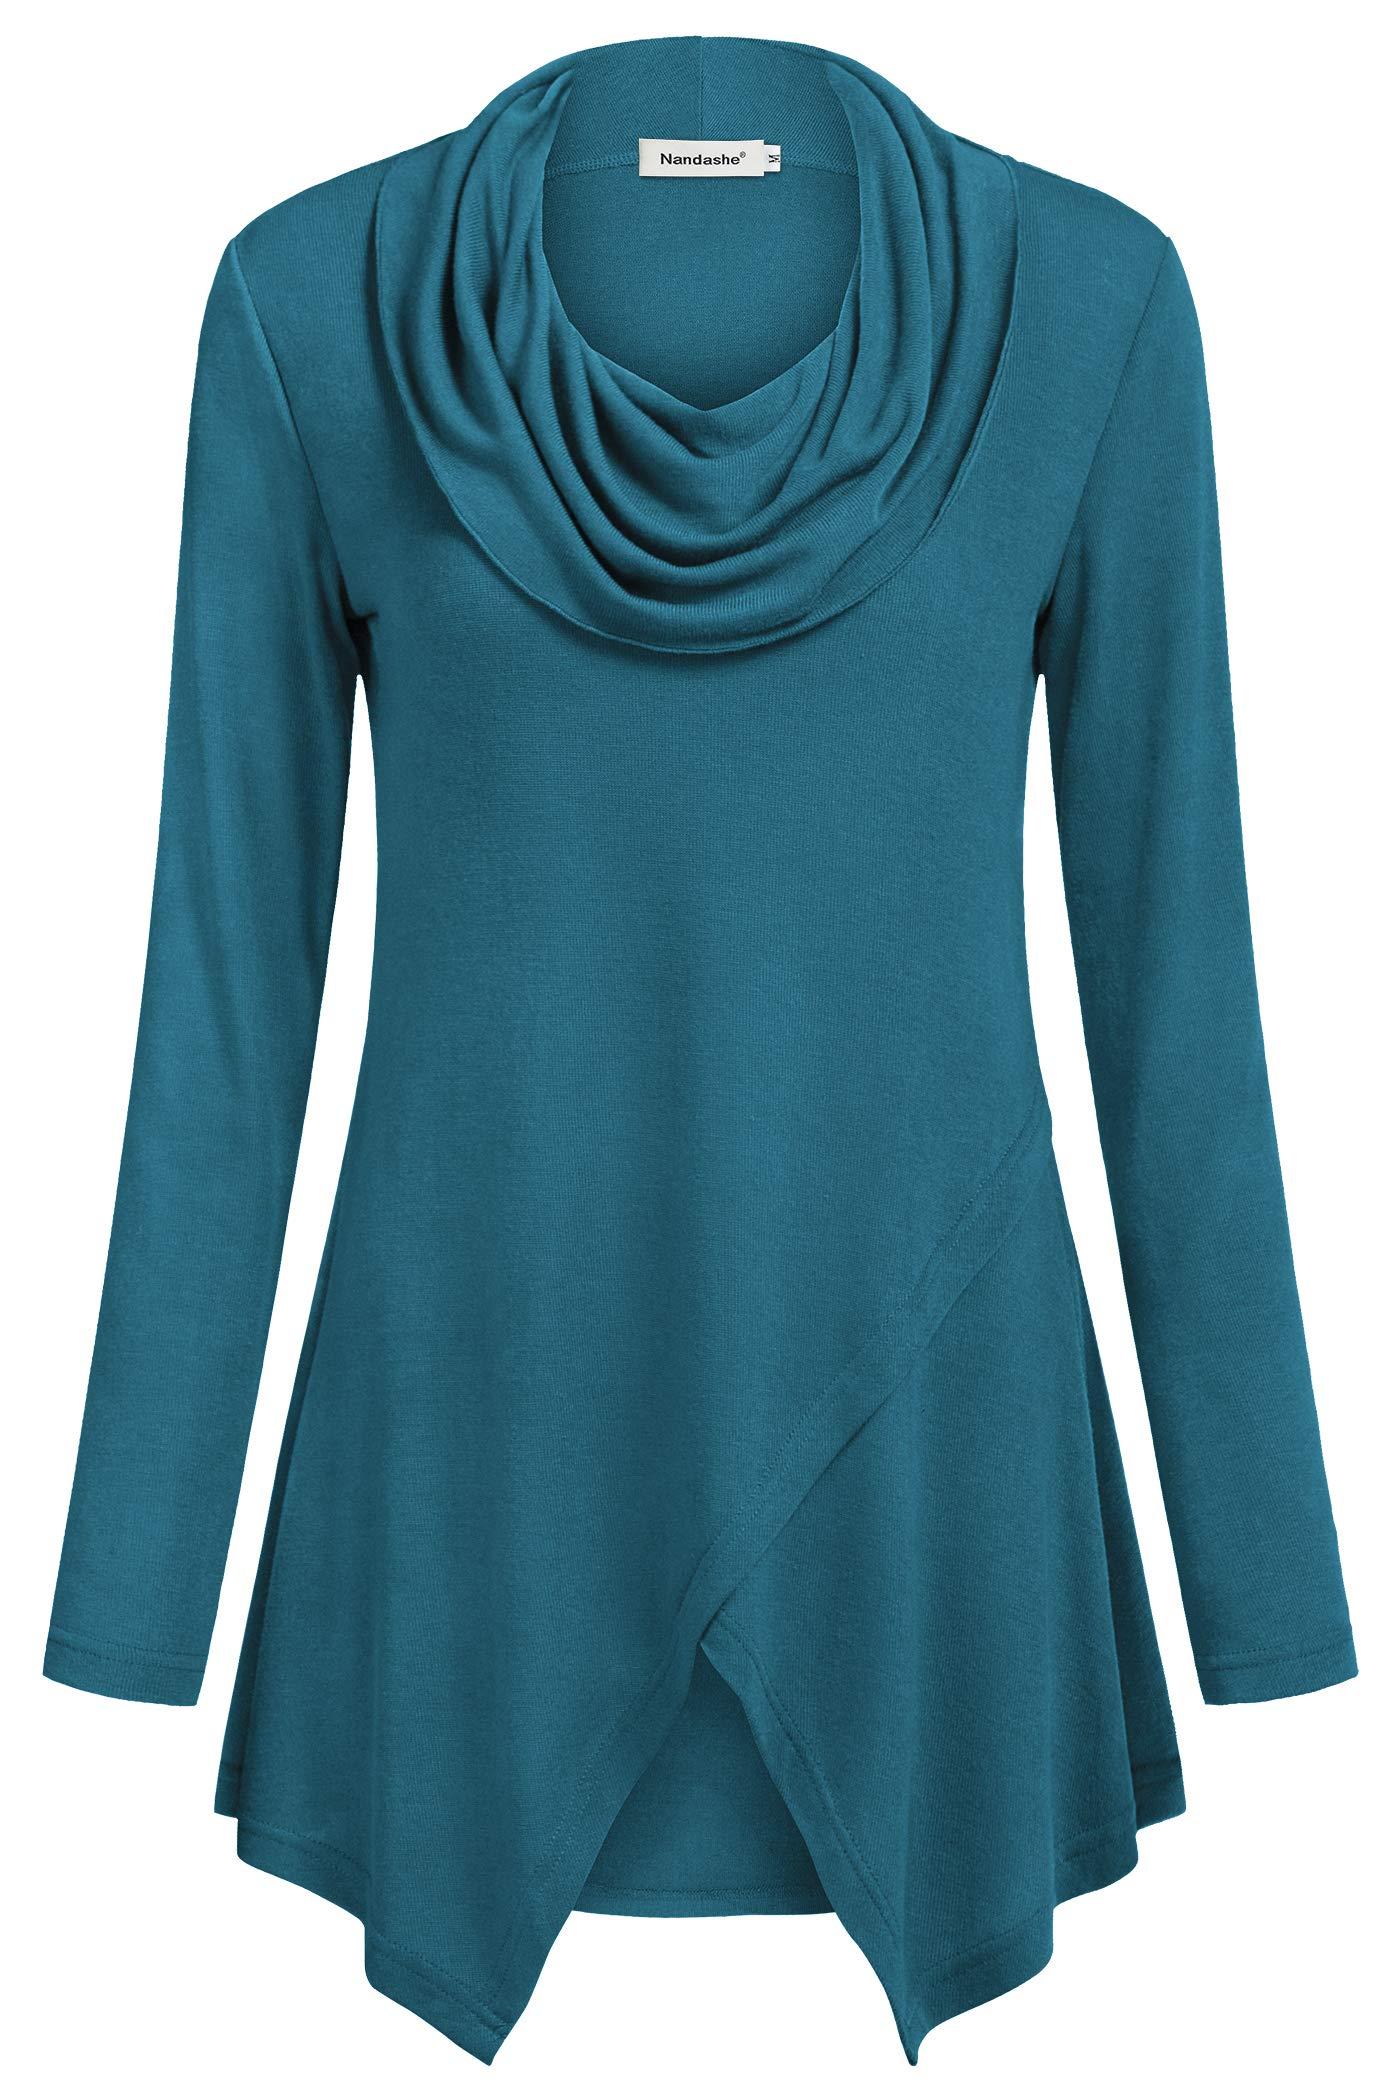 Nandashe Business Casual Clothes for Women, Long Tunic Tops to Wear with Leggings Pullover Tunic Shirt Soft Surroundings Womens Clothing Jersey T Shirt Women Knitwear Aqua Large